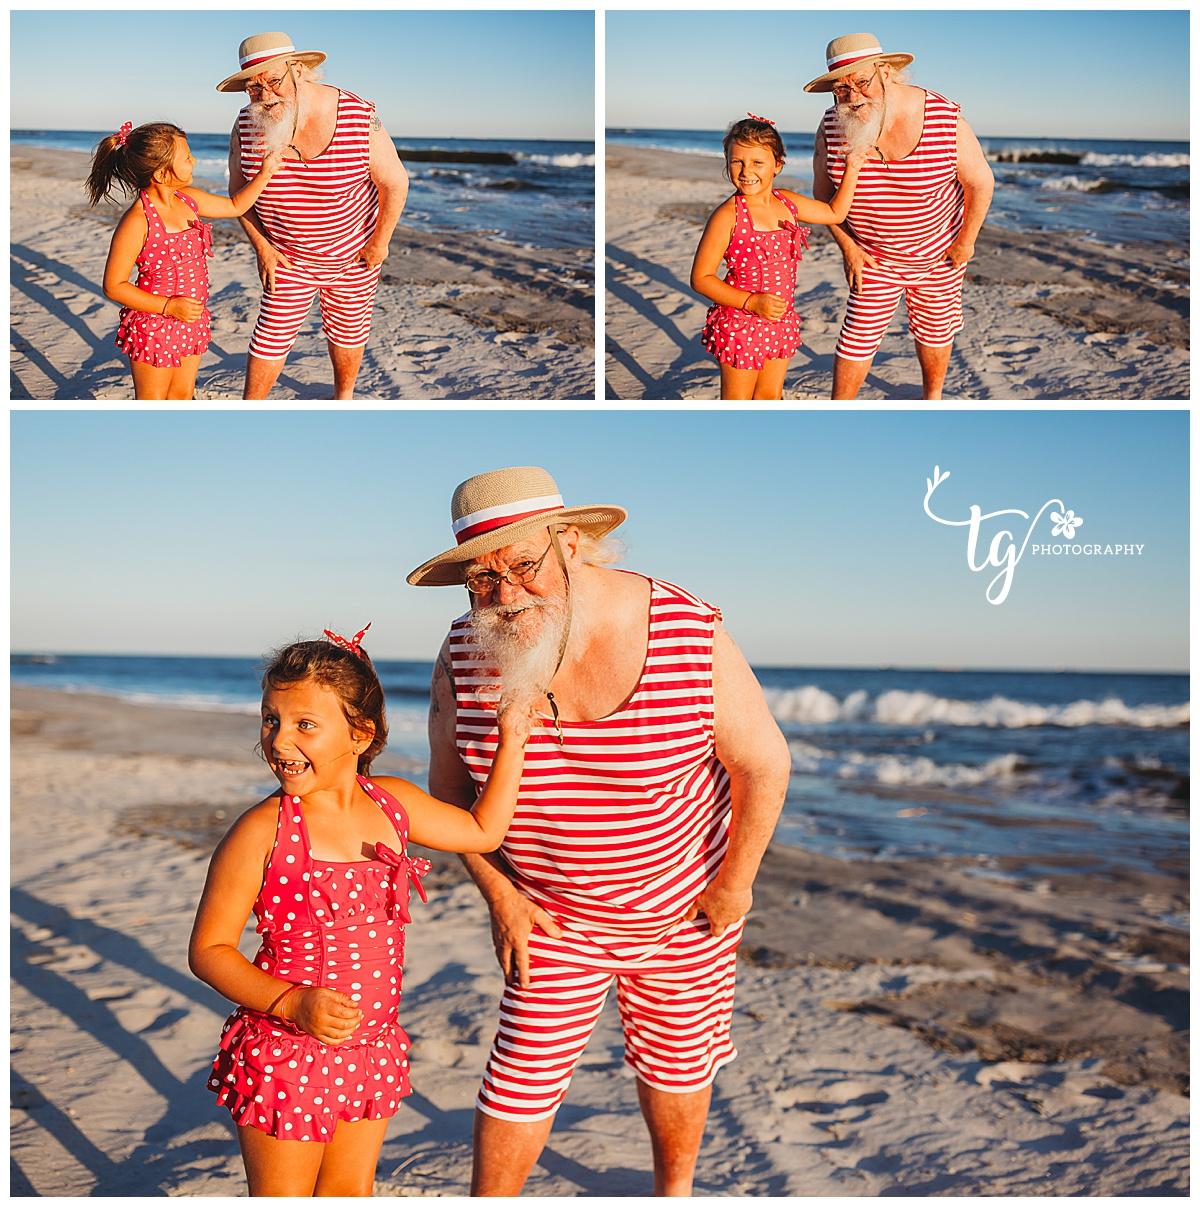 real beard Santa Claus holiday mini session on the beach